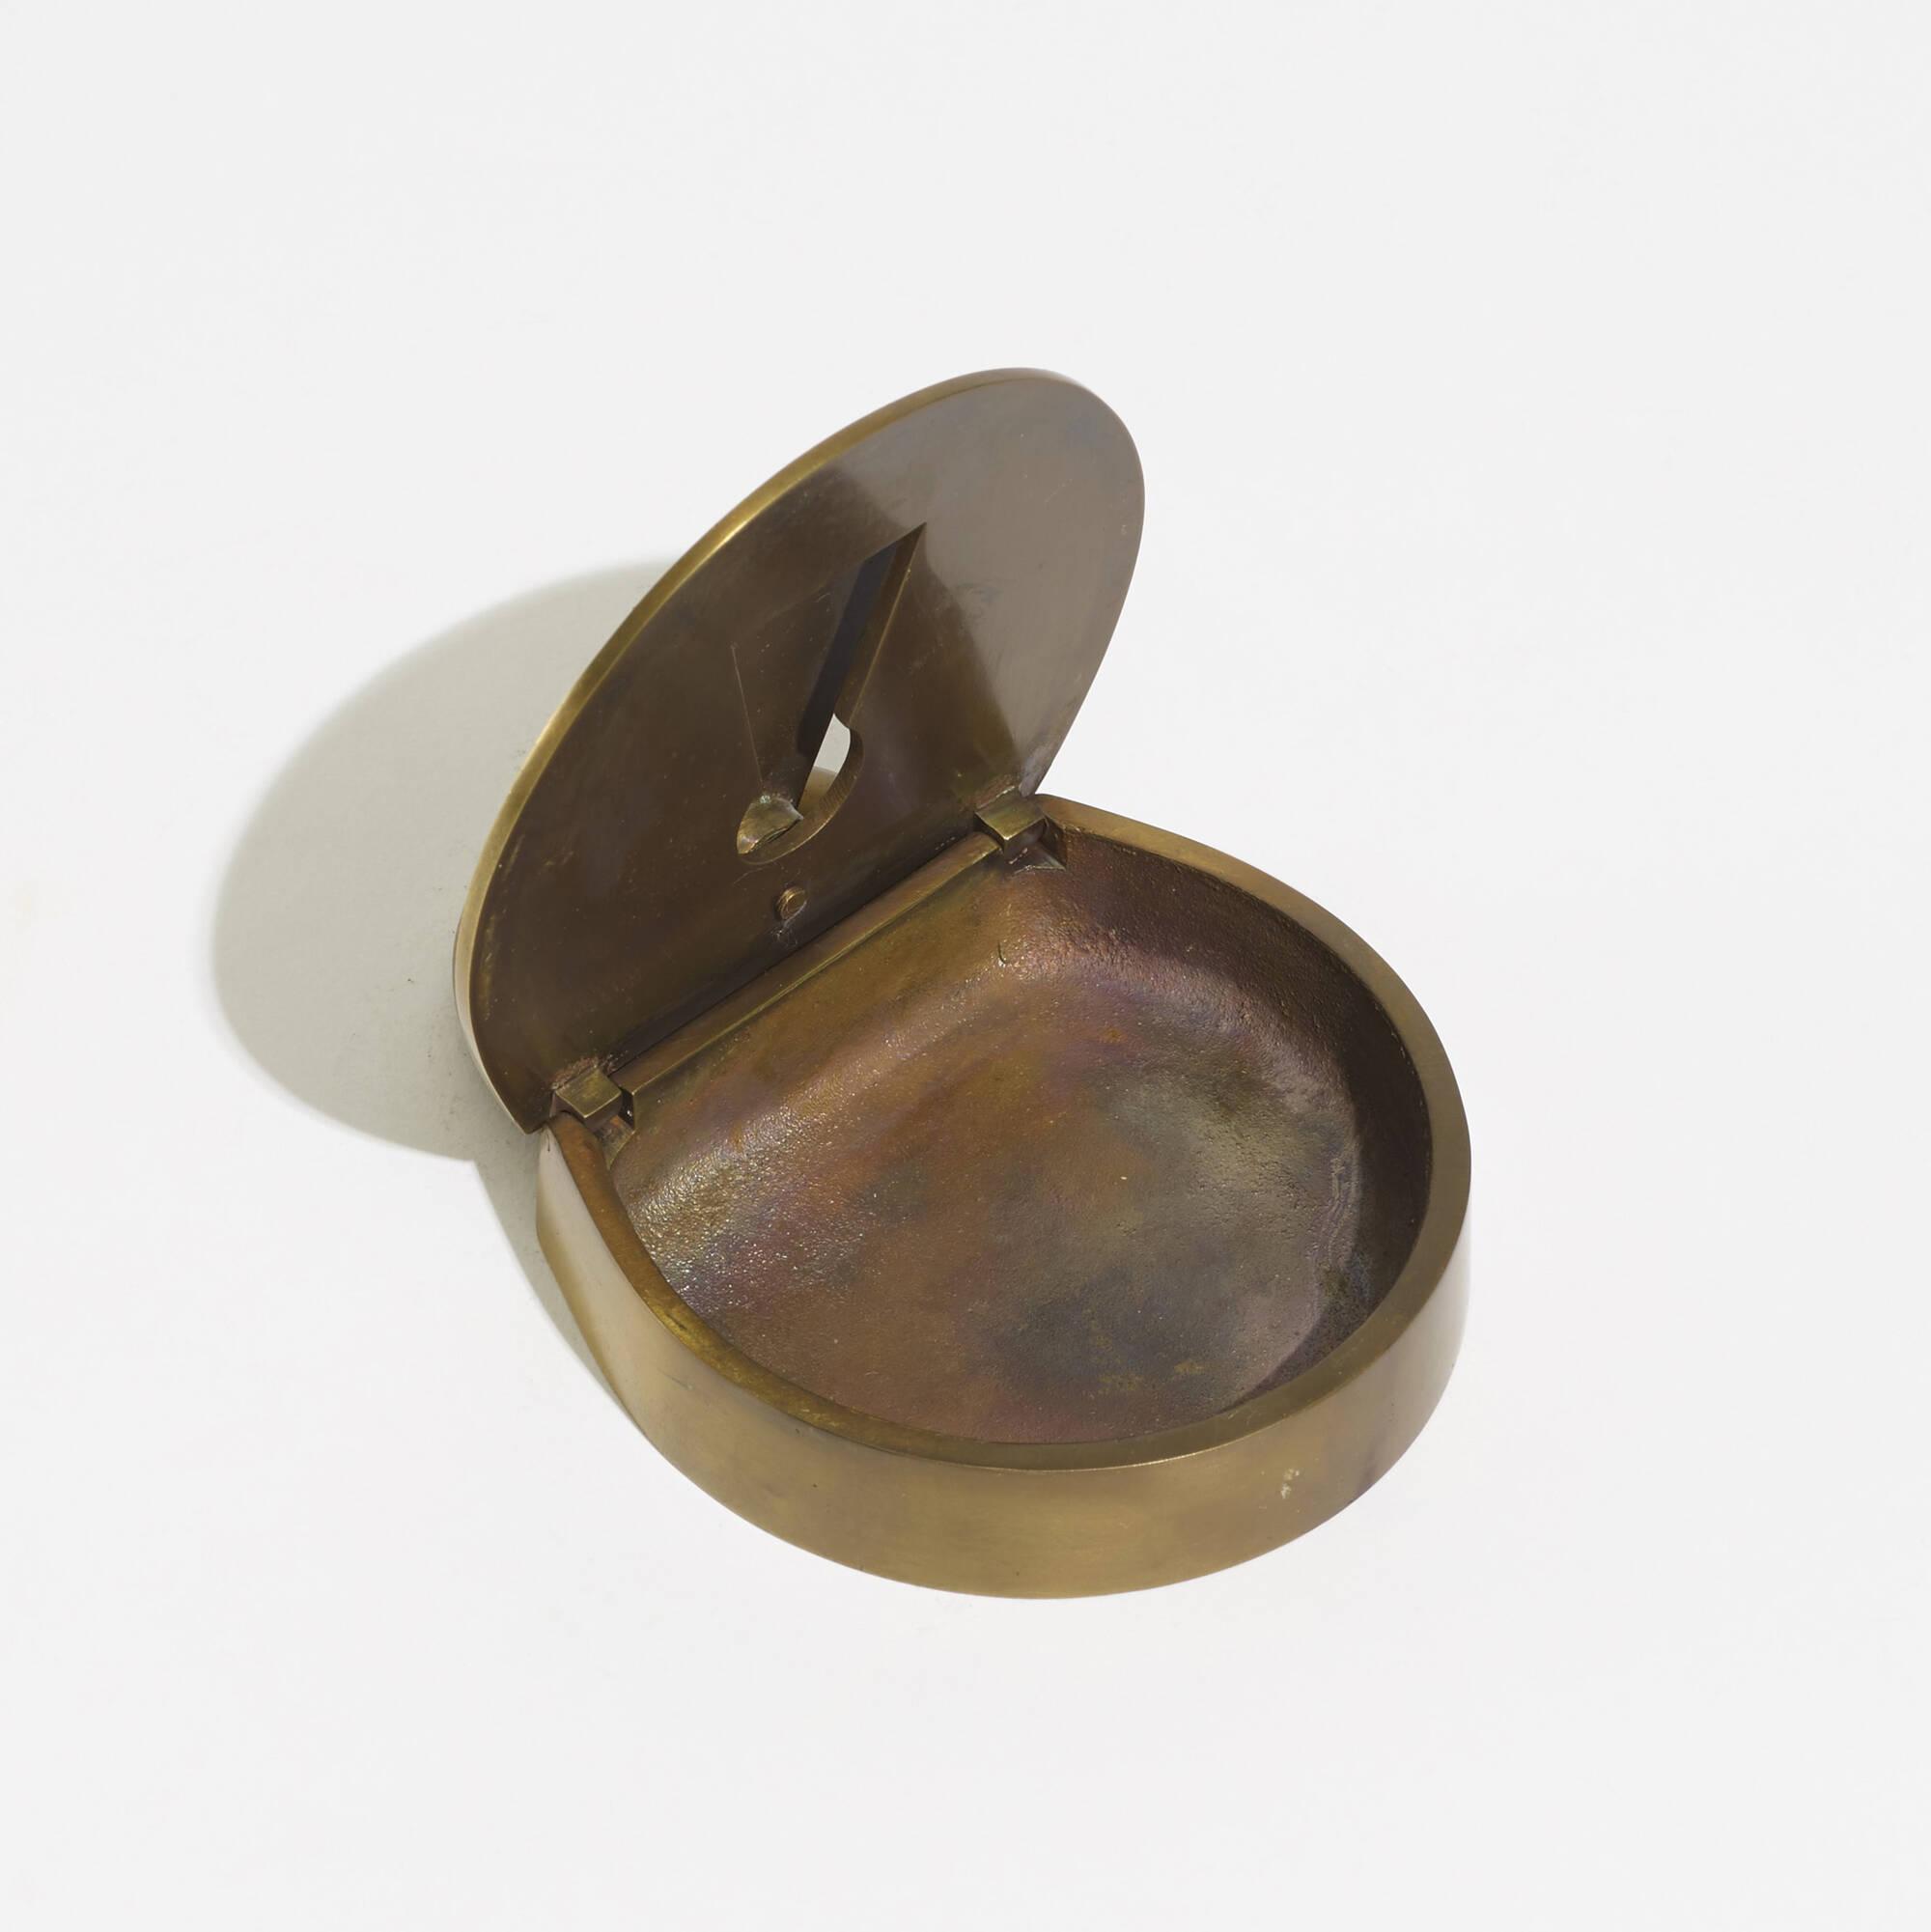 200: Carl Auböck III / ashtray, model 5012 (3 of 4)